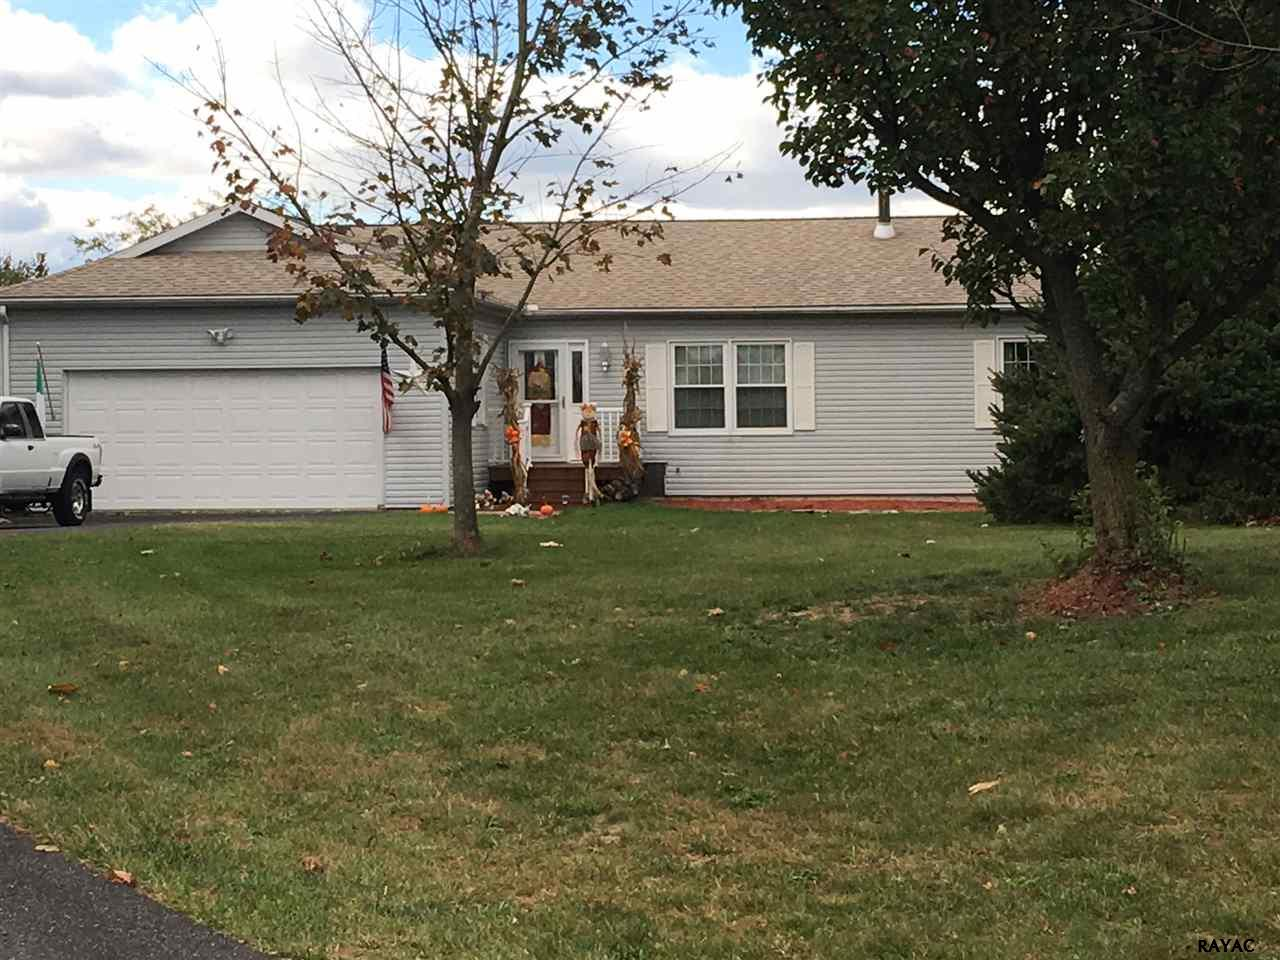 biglerville pa 17307 real estate houses for sale